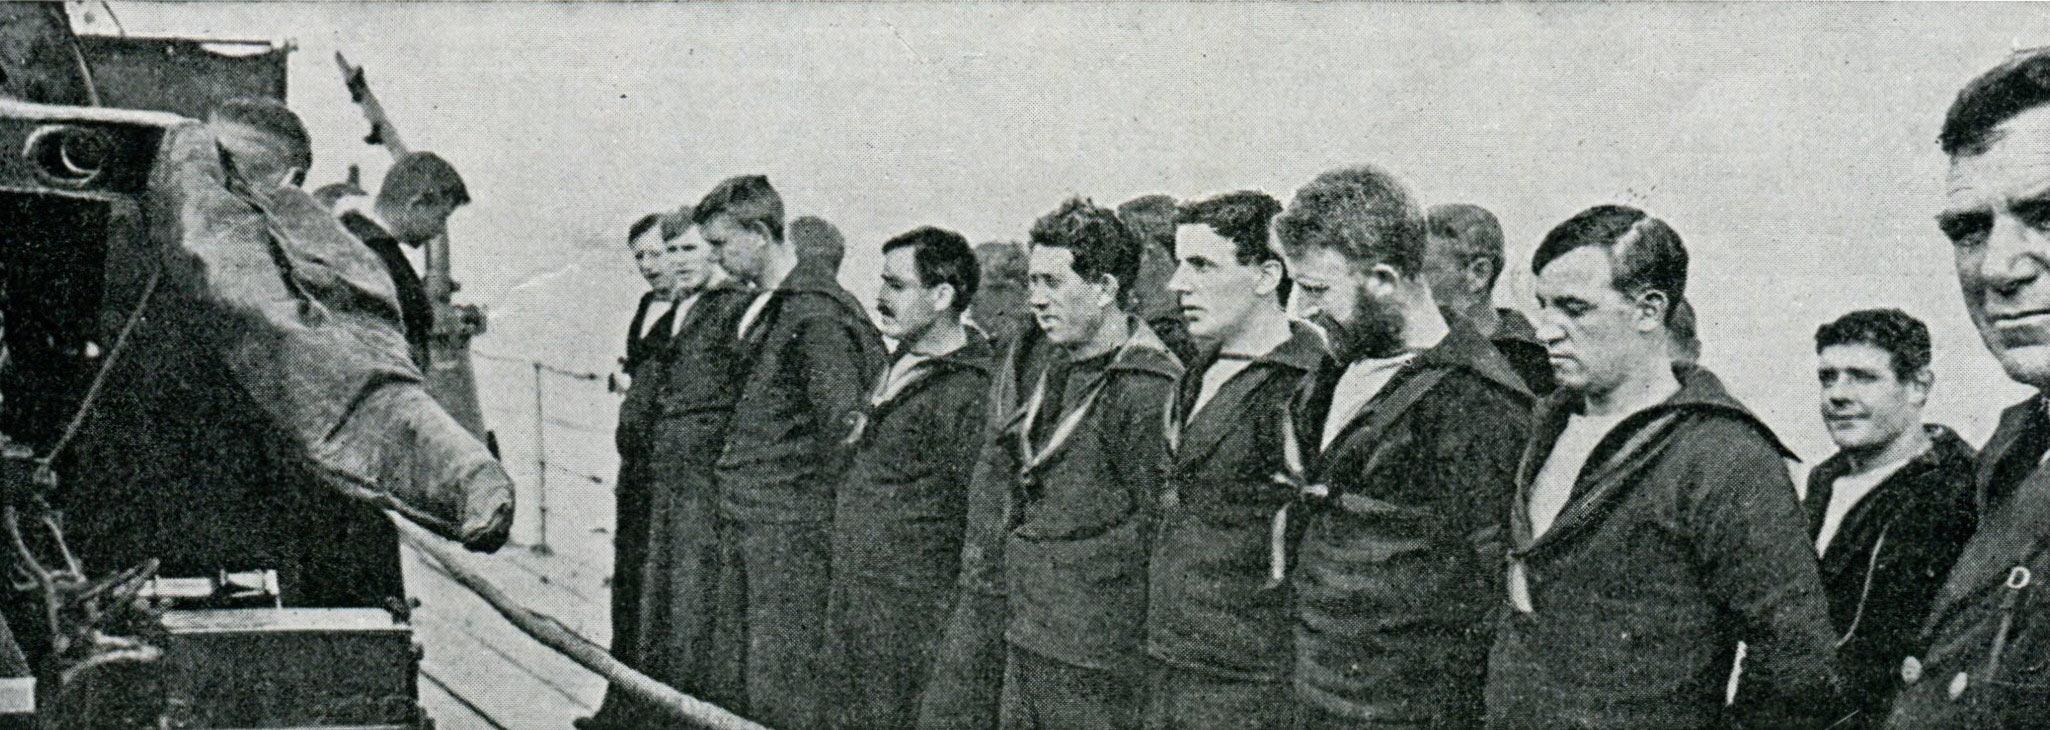 72-crew-of-hms-shark-at-divine-service-before-jutlandaaa.jpg